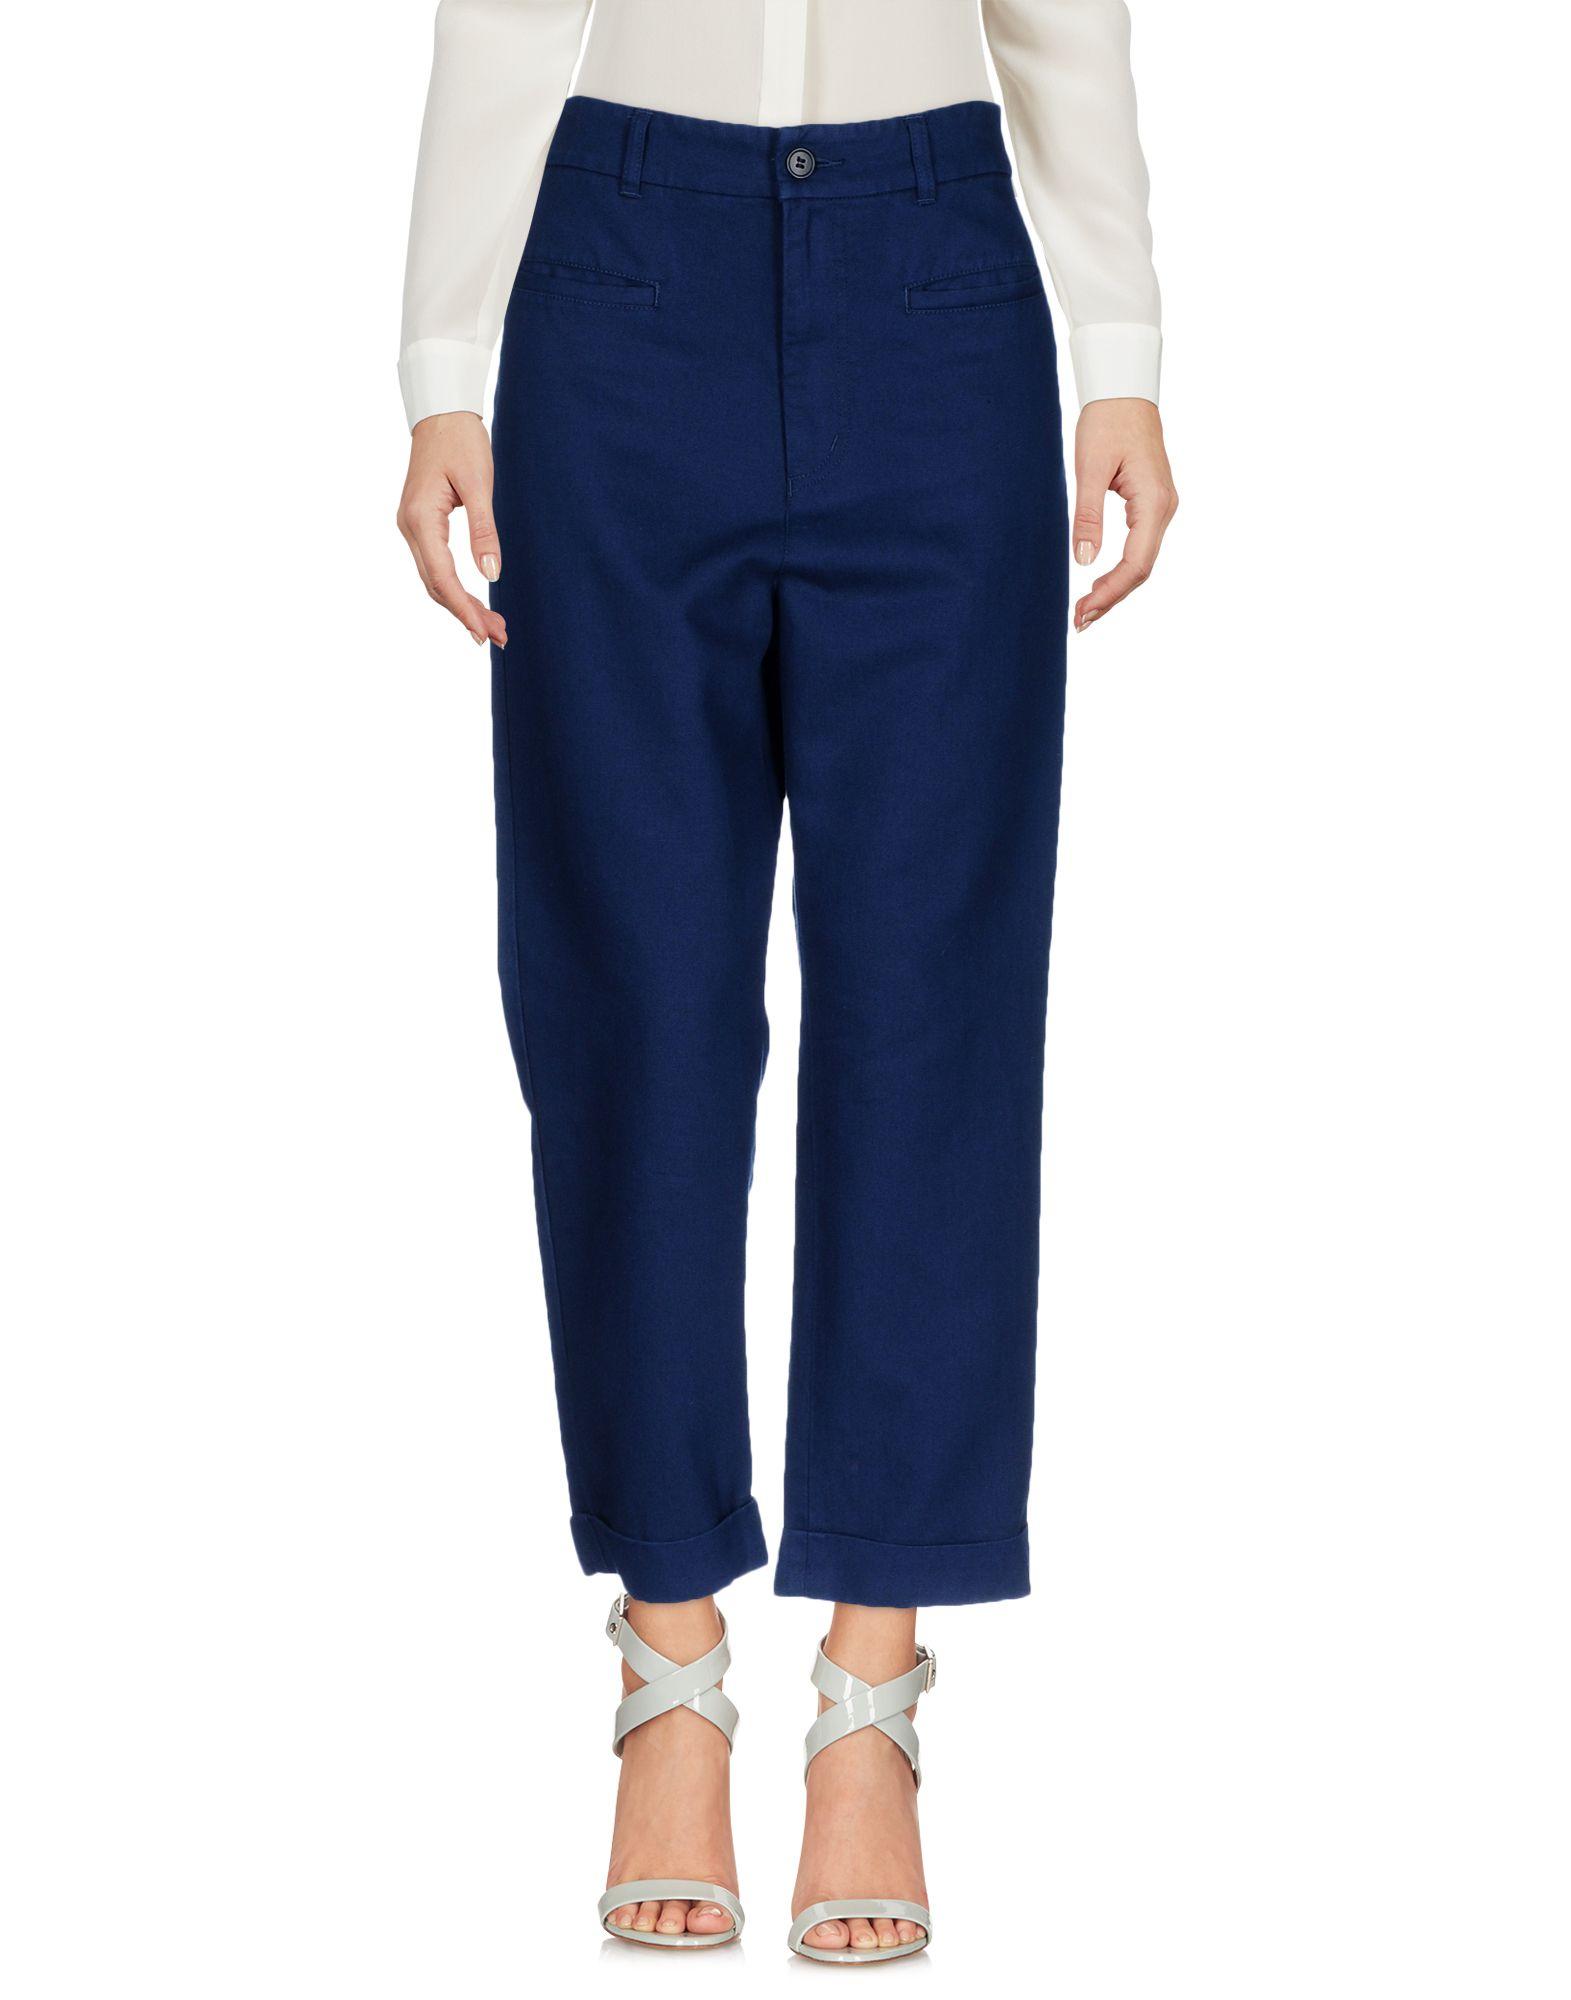 Pantalone Zucca Donna - Acquista online su 5uVRJL1